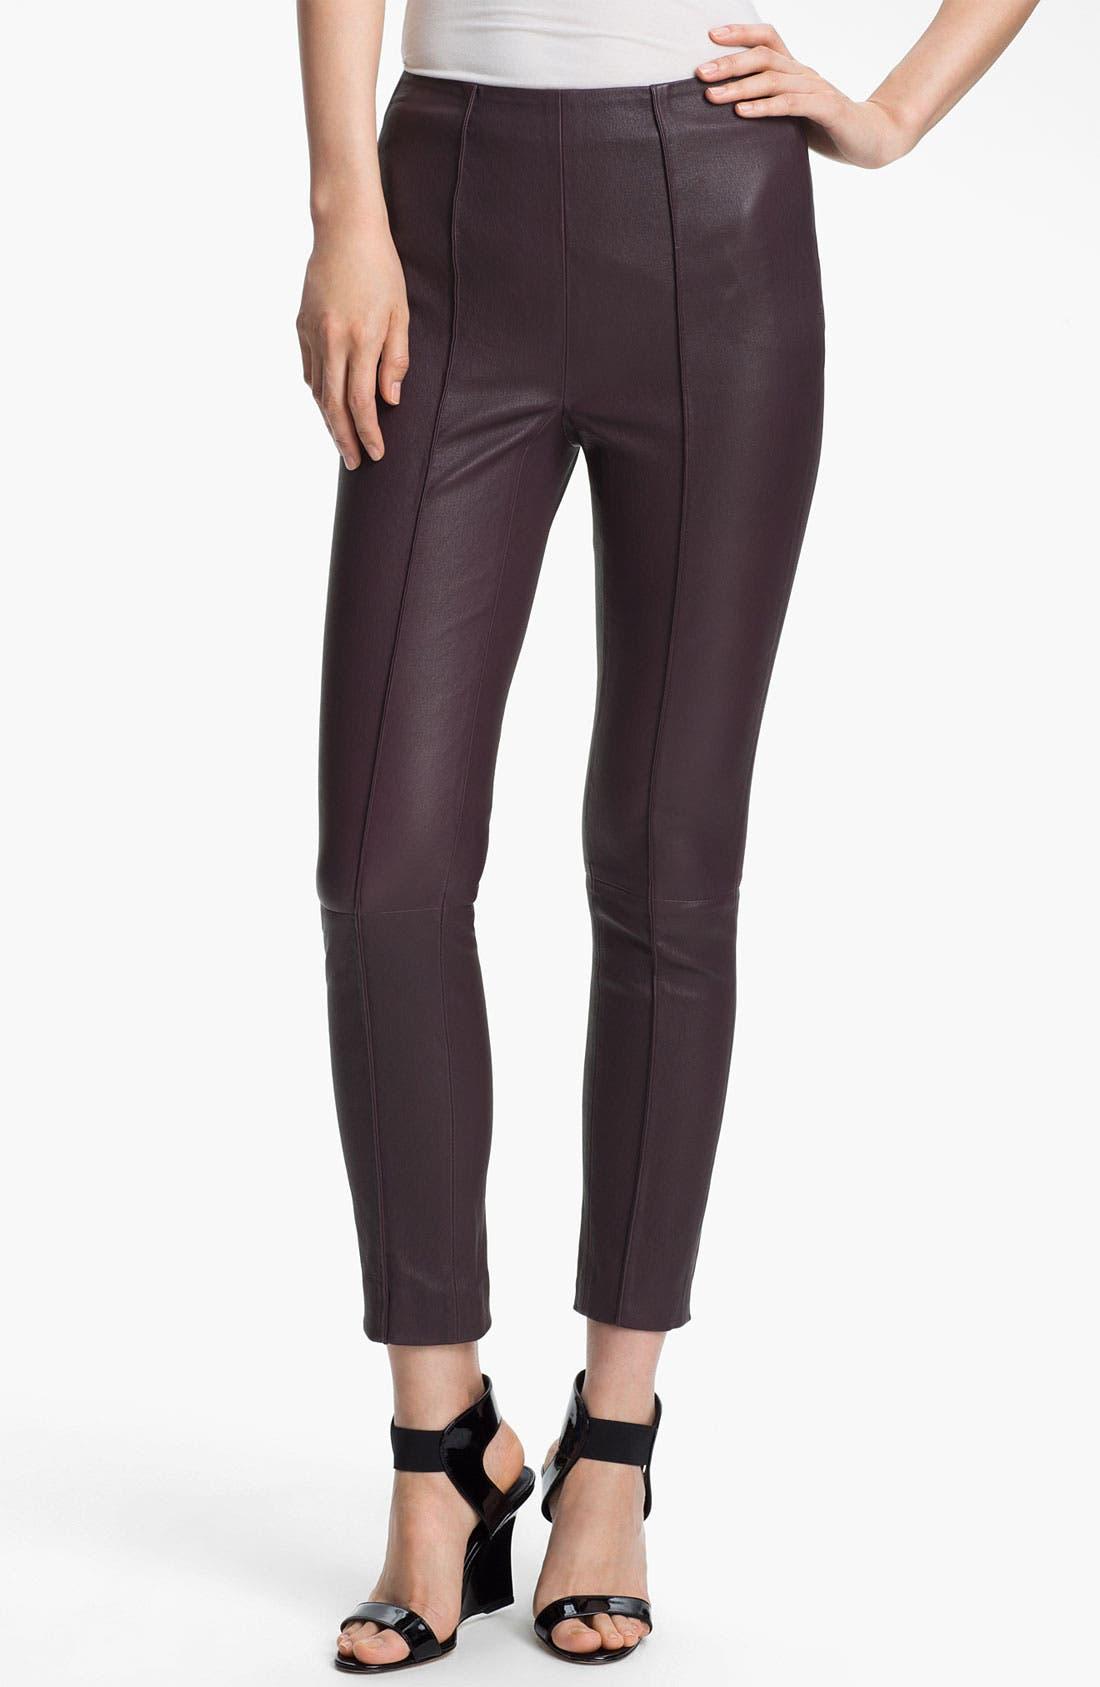 Alternate Image 1 Selected - Twenty8Twelve 'Isiadore' Stretch Leather Pants